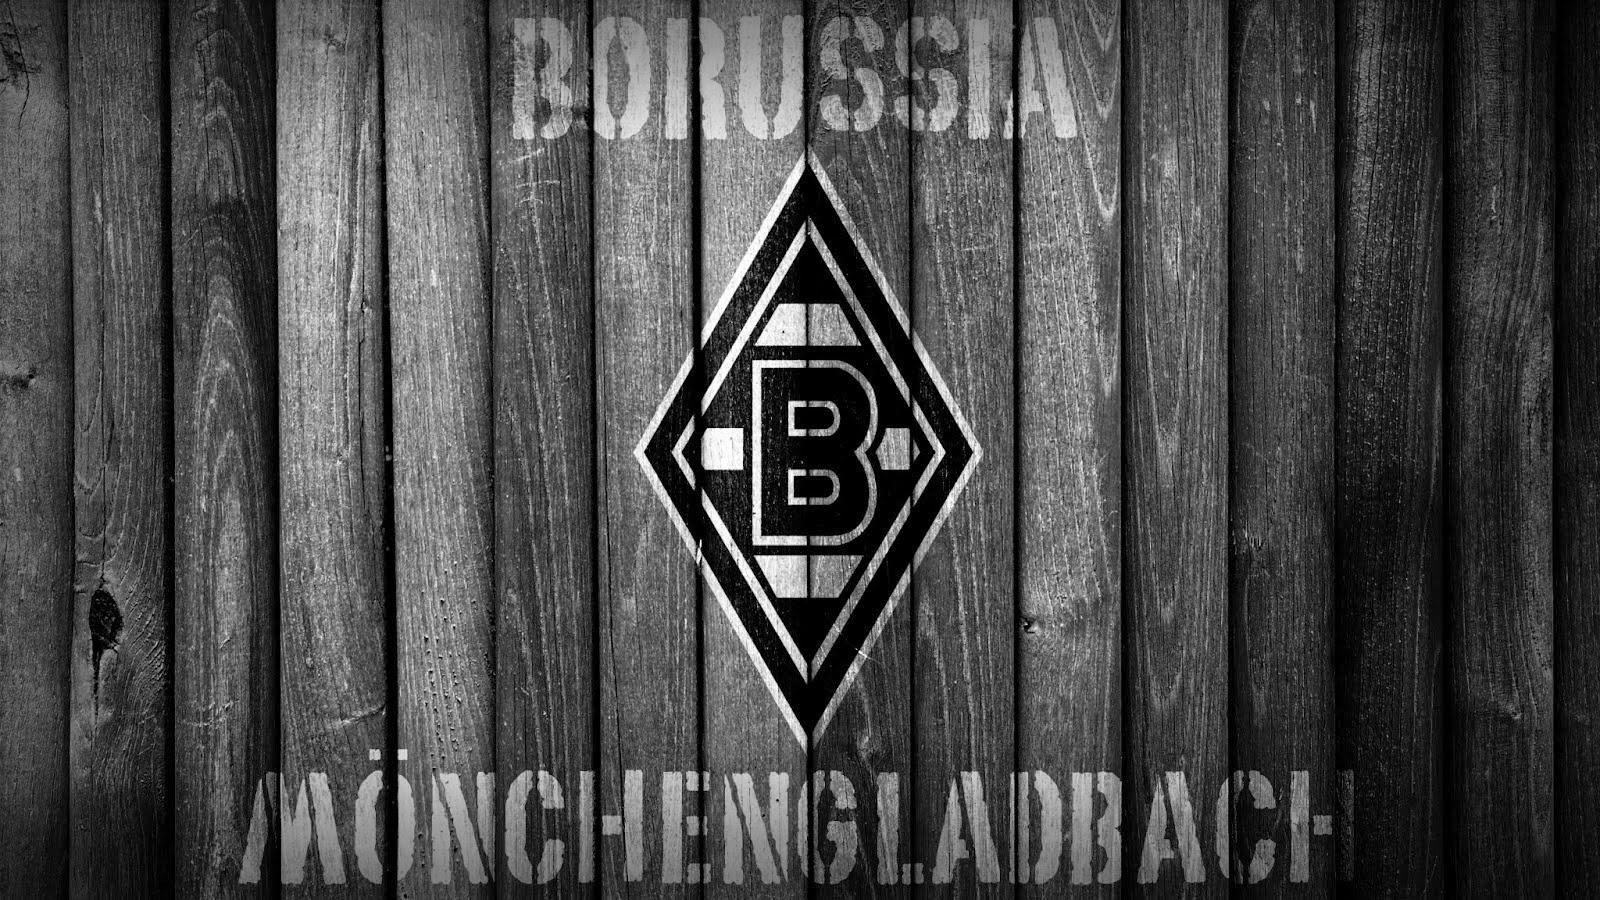 Berühmt Borussia Monchengladbach Wallpapers | Download Gambar @BF_28